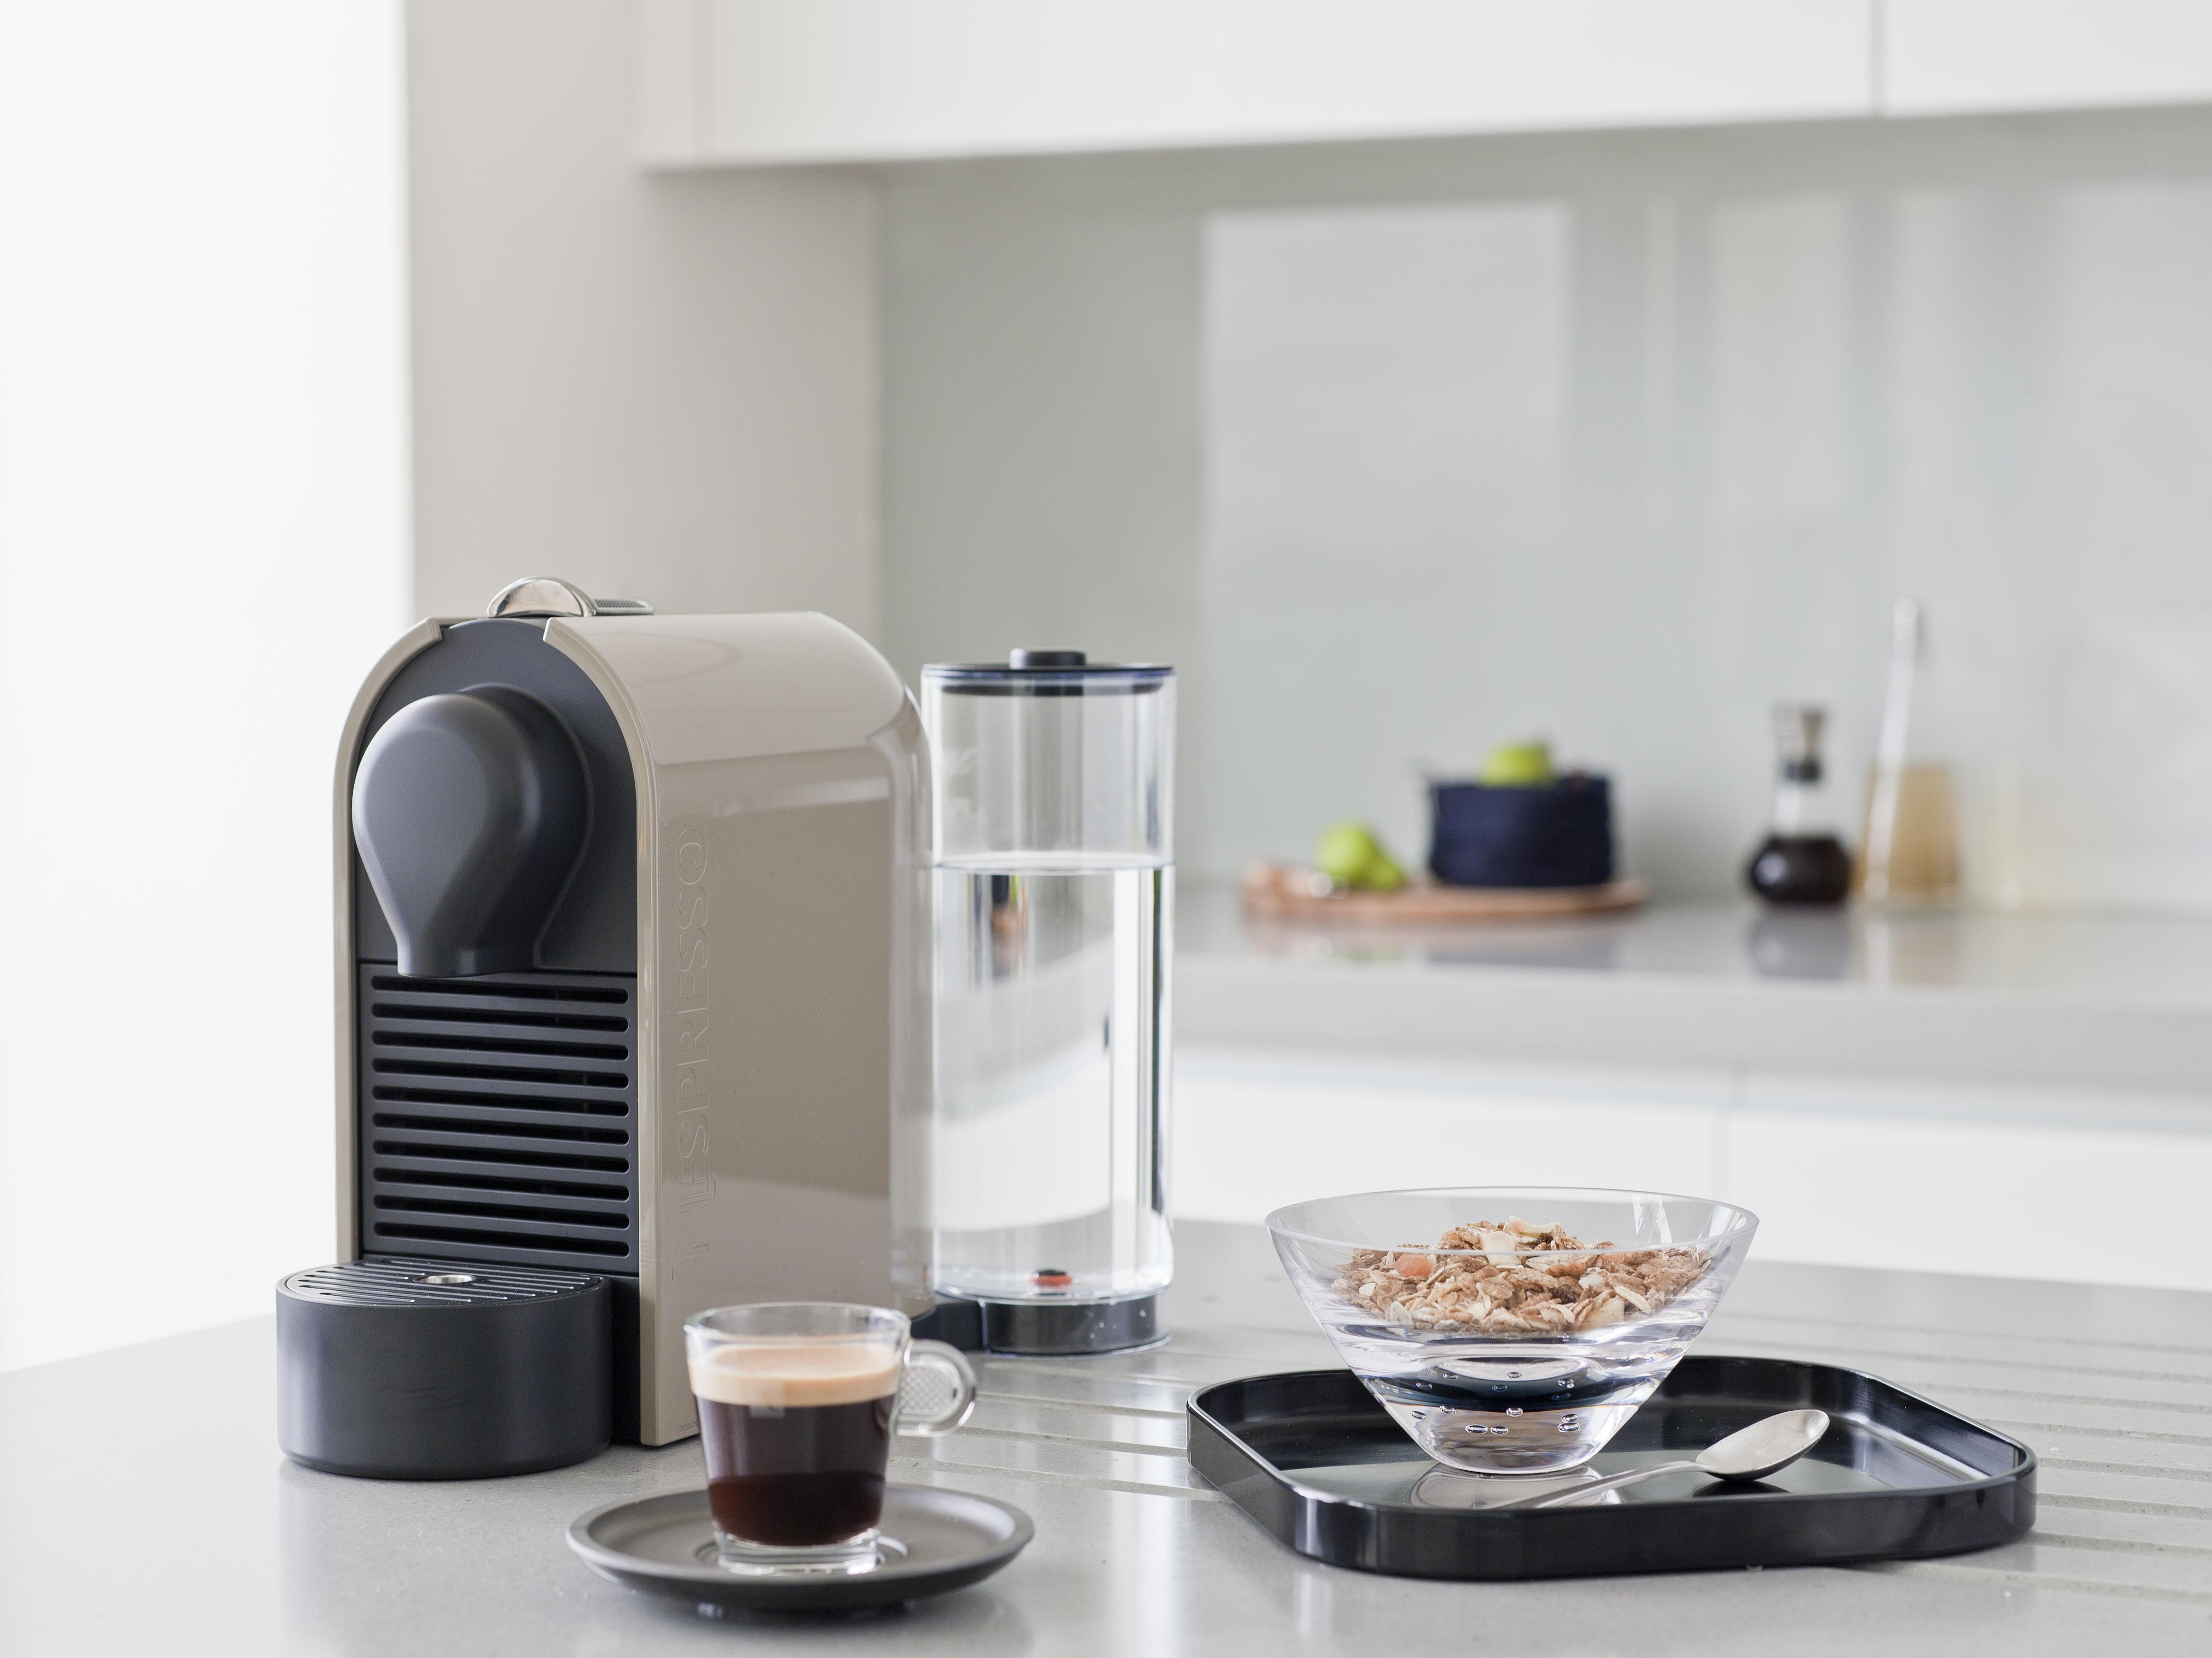 Vind den fine nye U kaffemaskine fra Nespresso